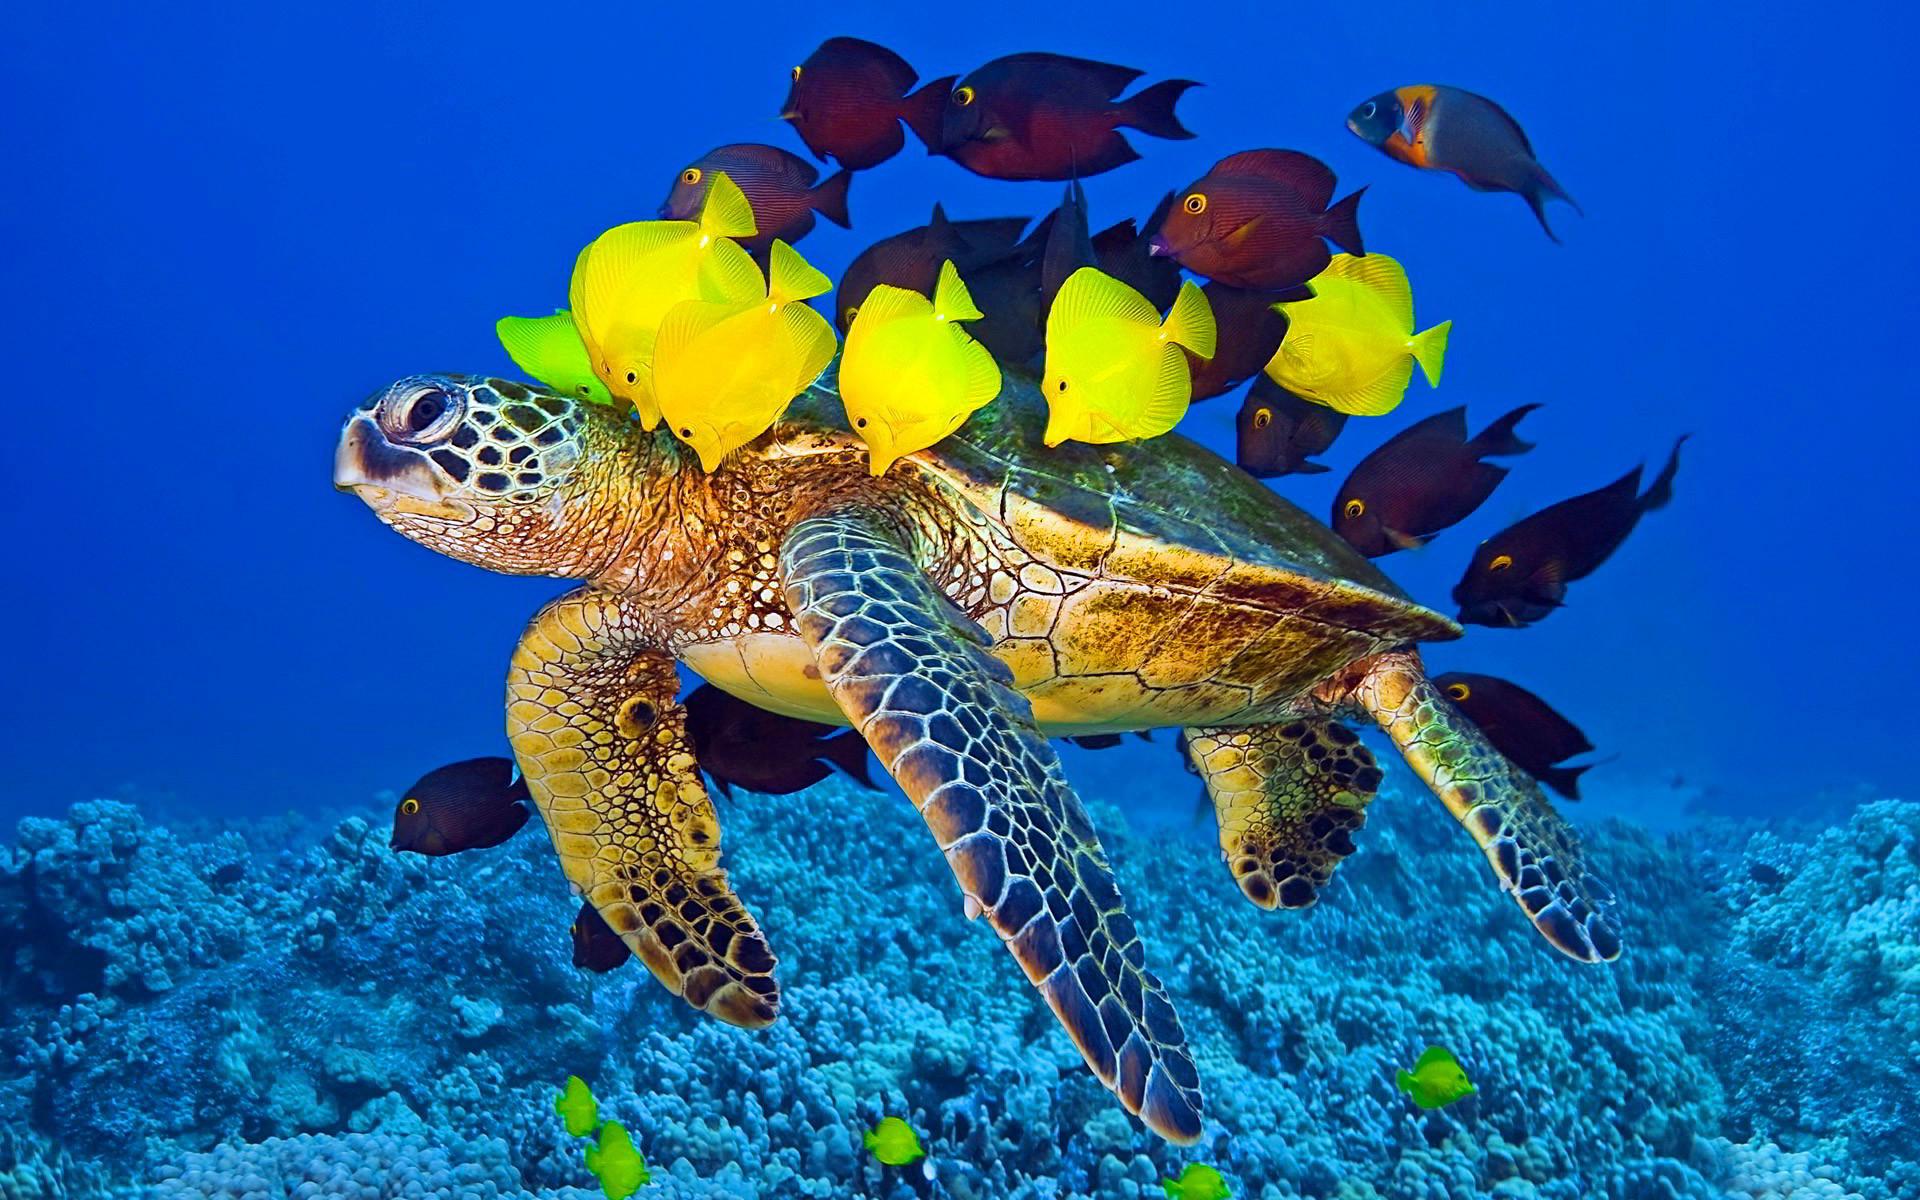 Ultra HD hawksbill turtle | Ultra HD Wallpapers | Pinterest | Turtle and Sea  turtles